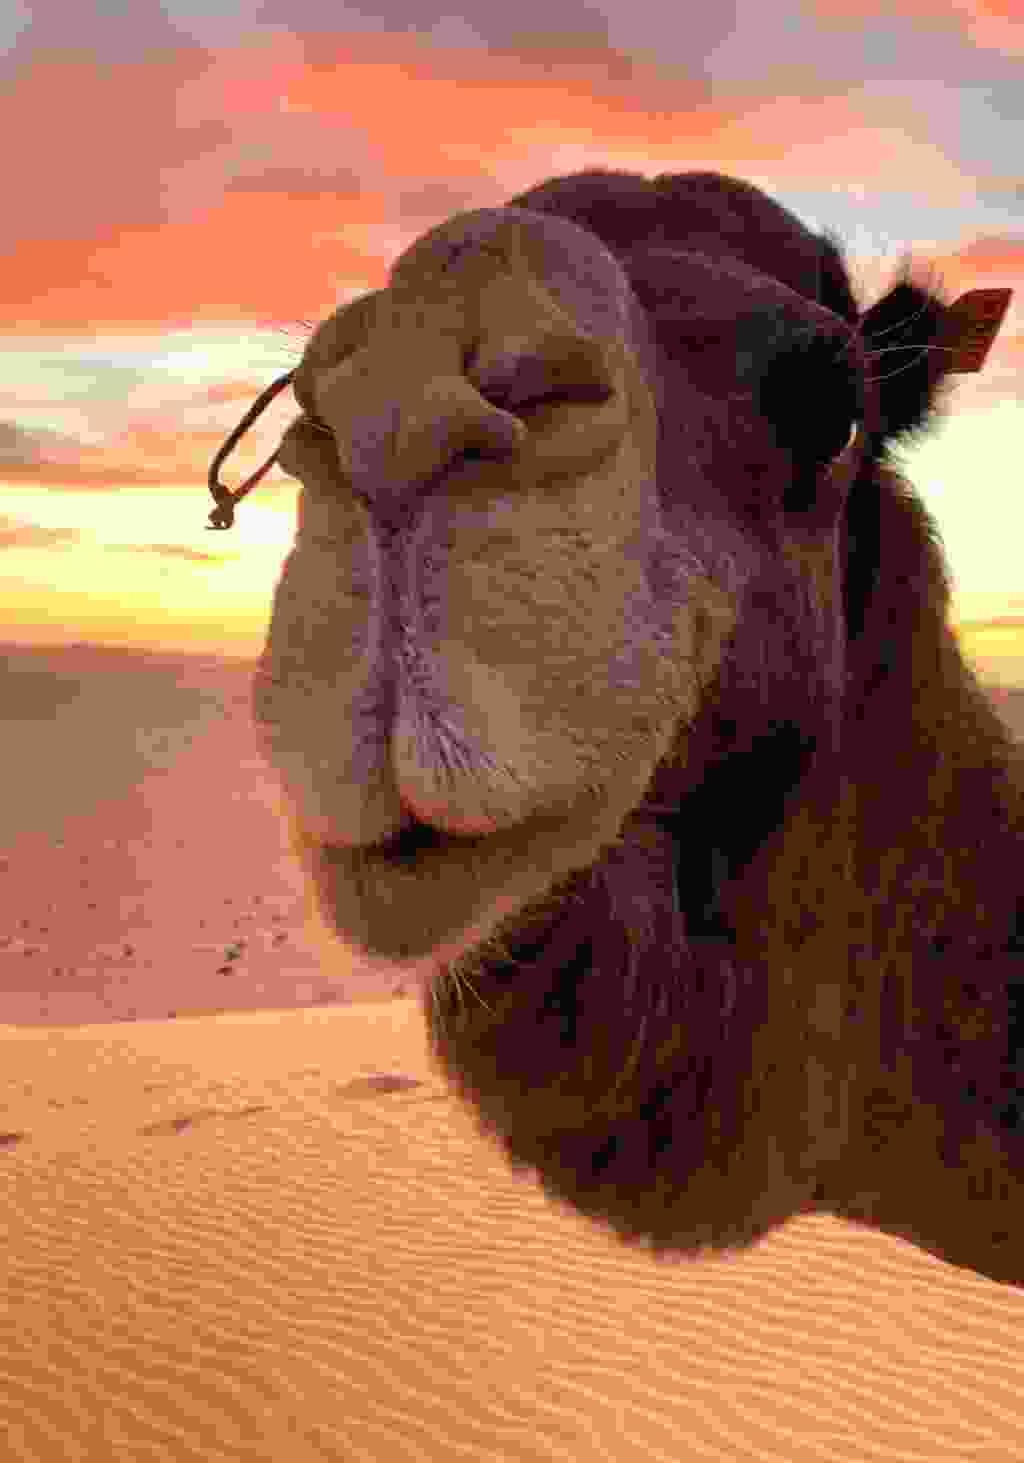 The Saharan sunset (Alice Morrison)